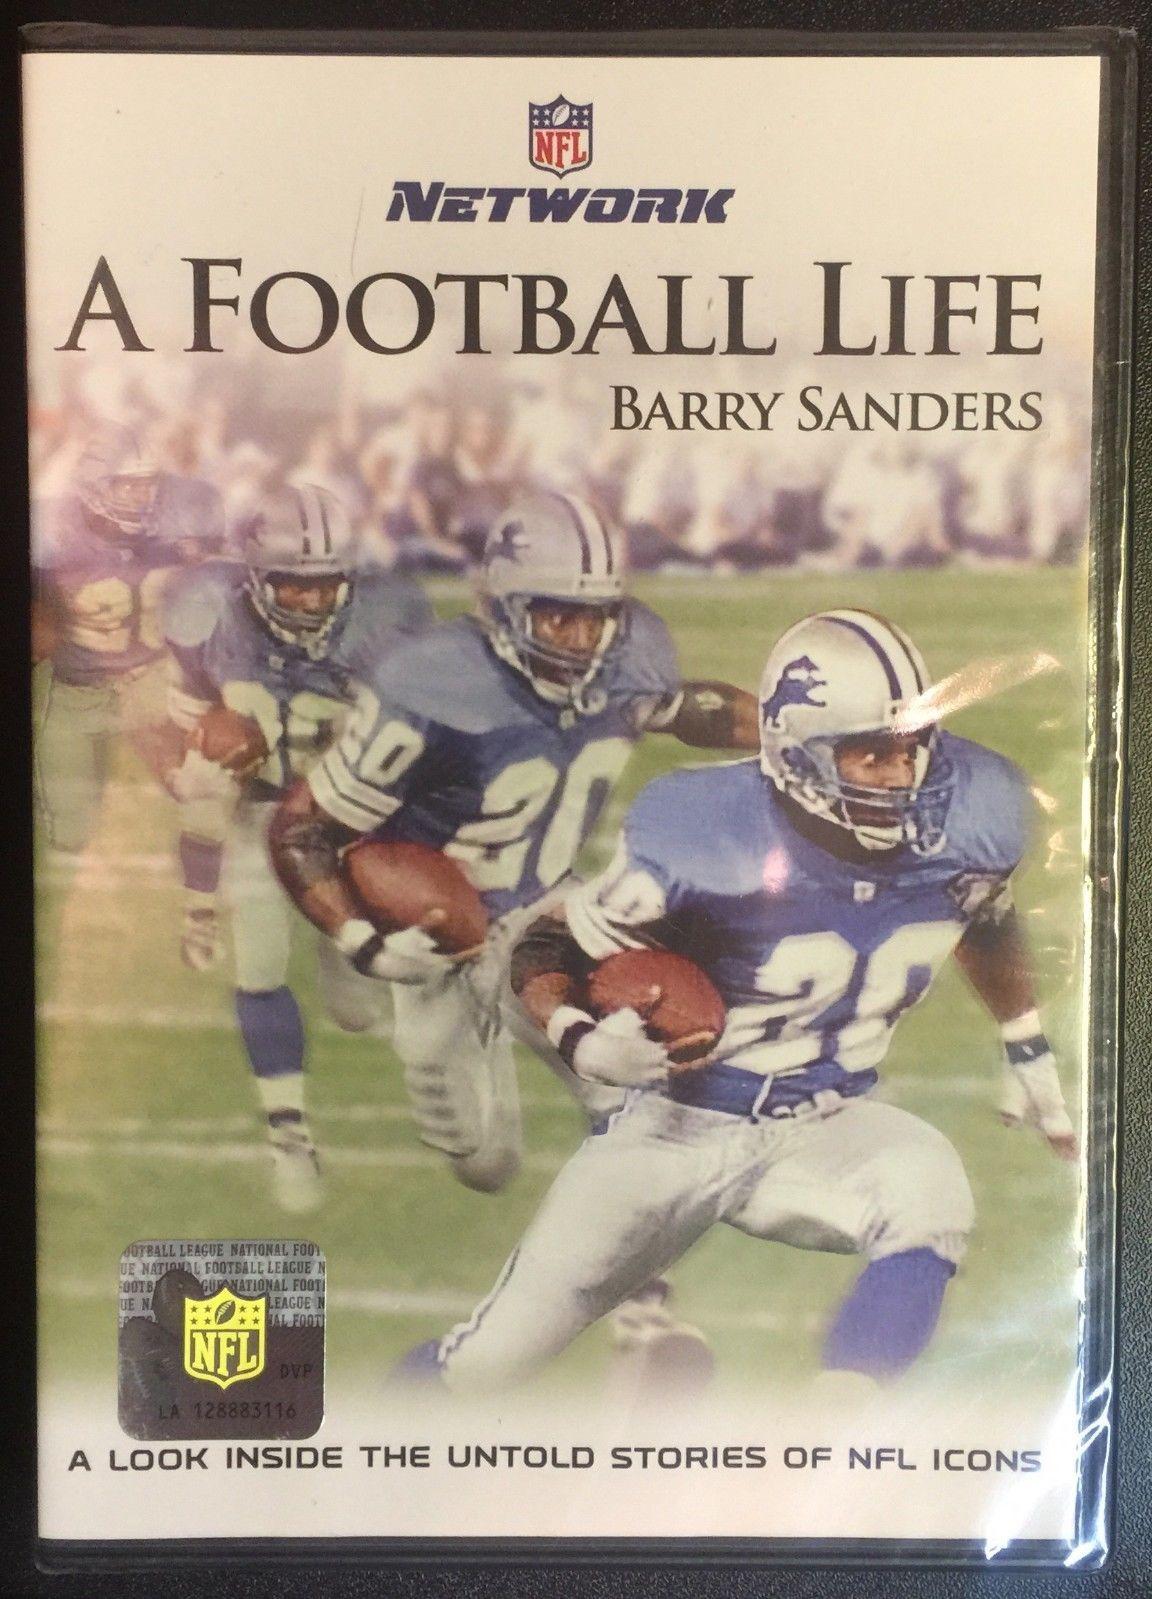 New NFL Network A Football Life Barry Sanders DVD Nfl